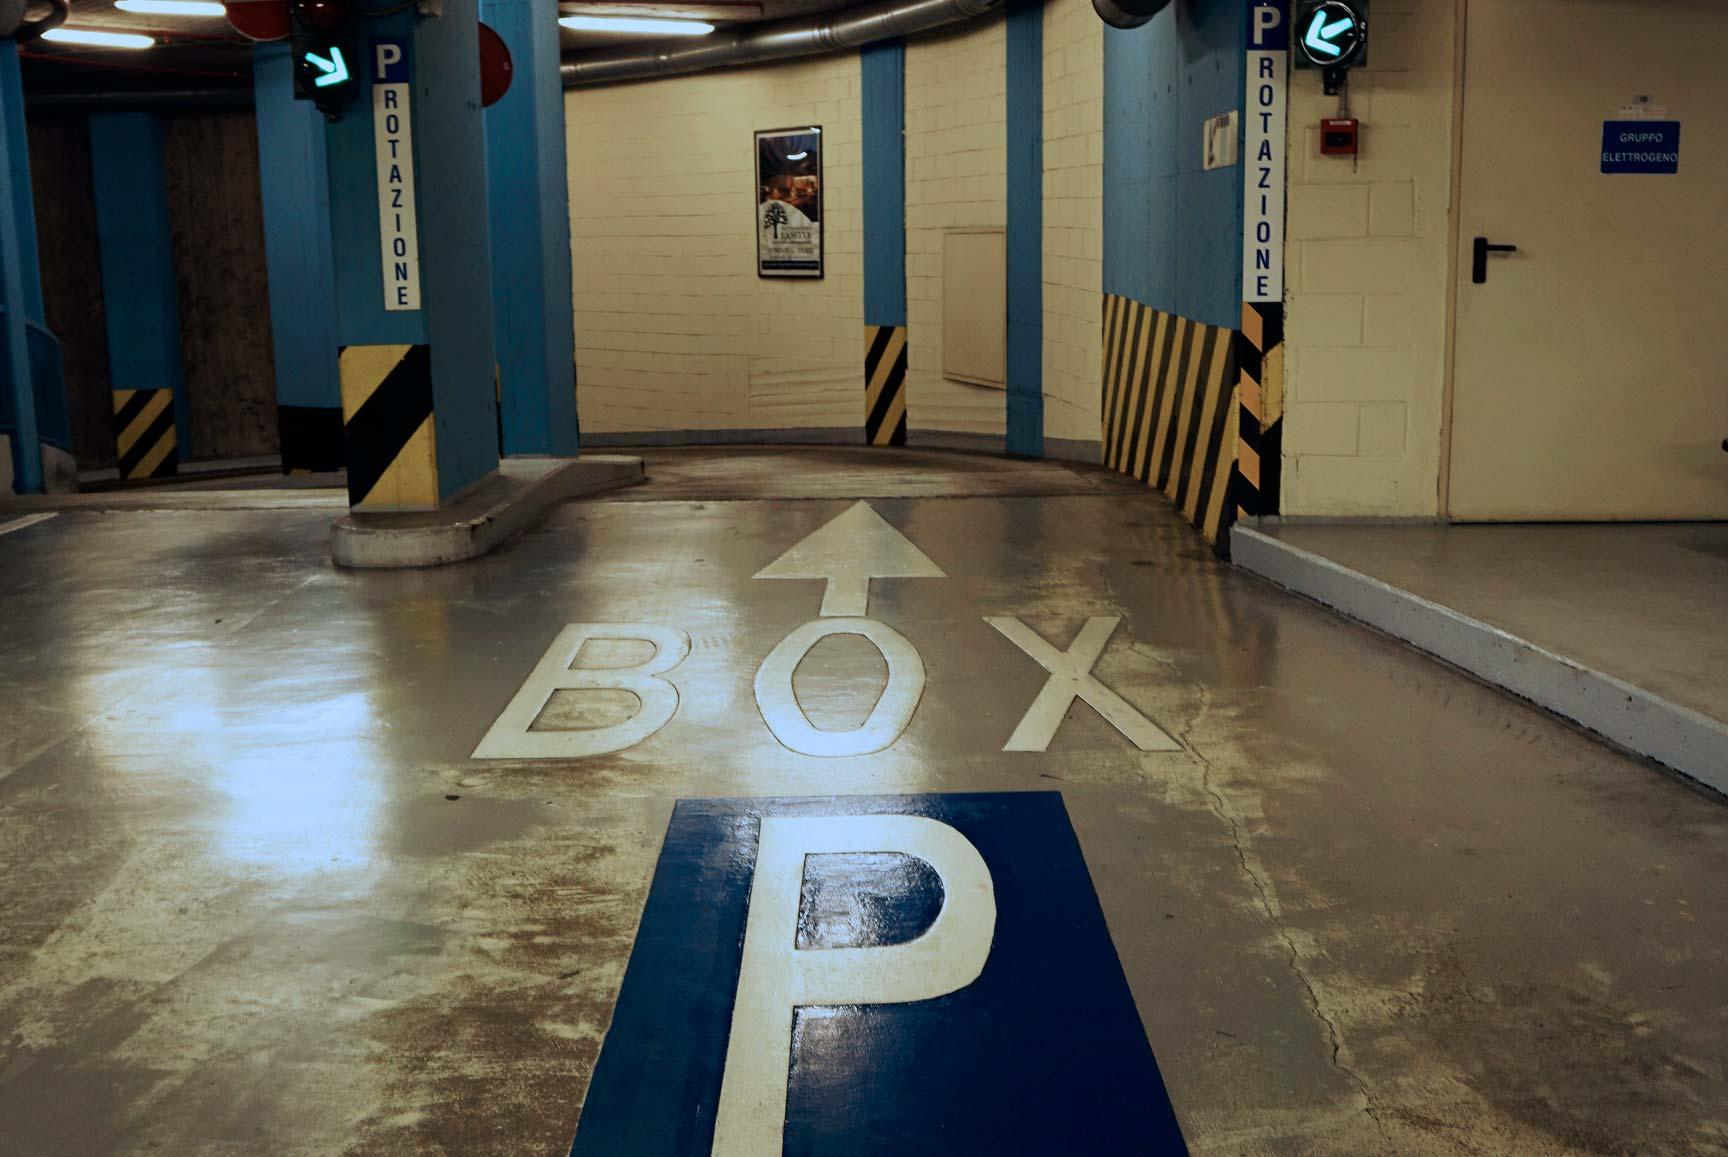 <h1><b>Buonaparte Parking</b> </h1>